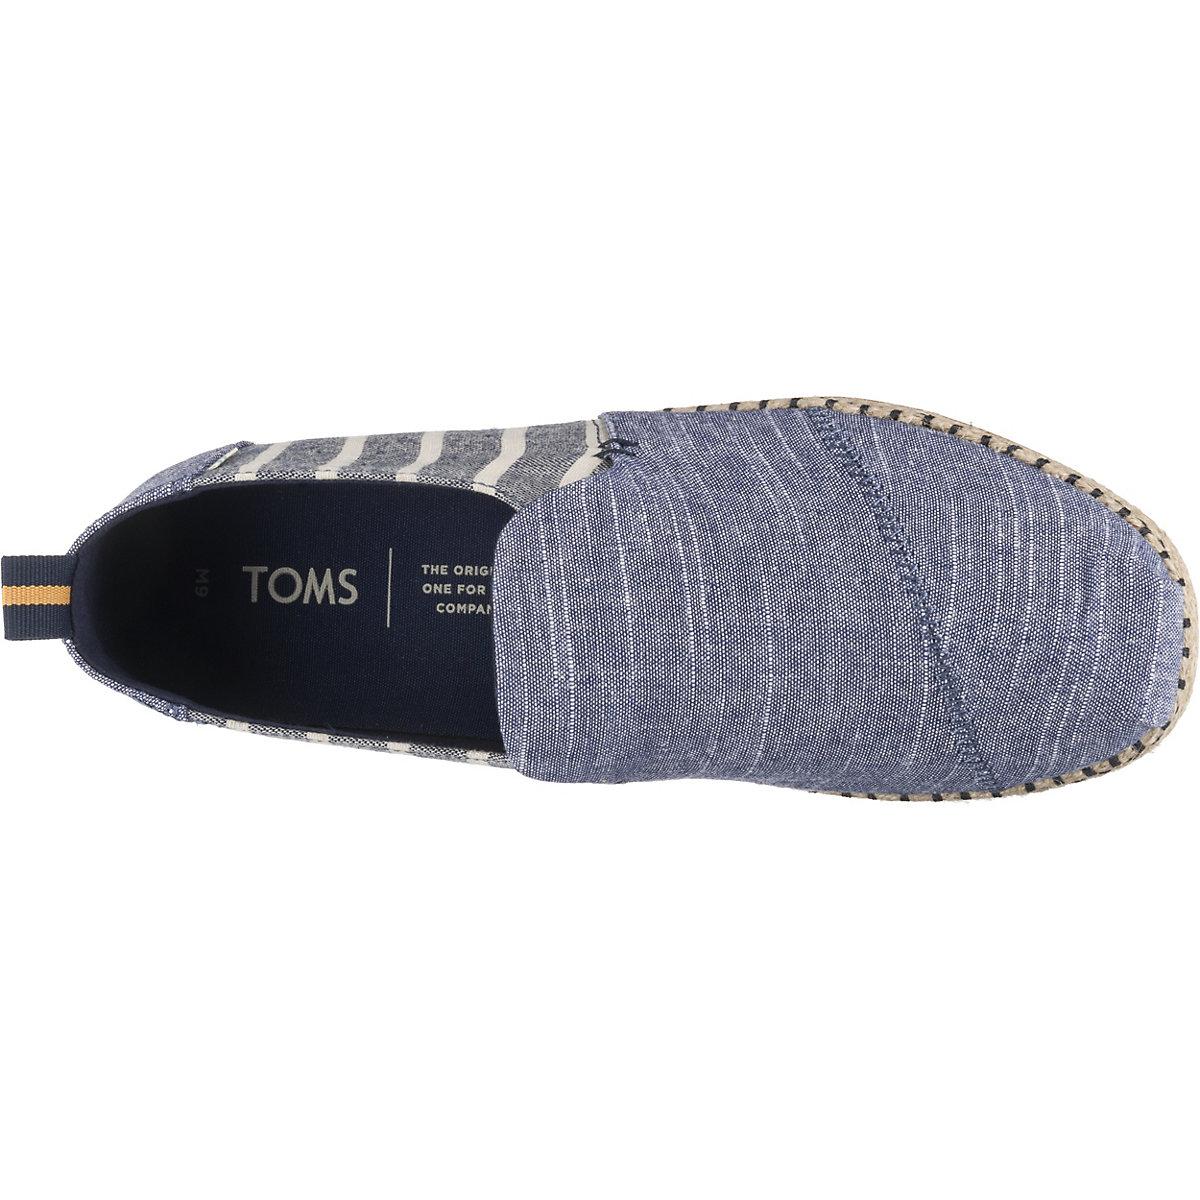 Toms, Deconstructed Alpargata Rope Klassische Slipper, Dunkelblau